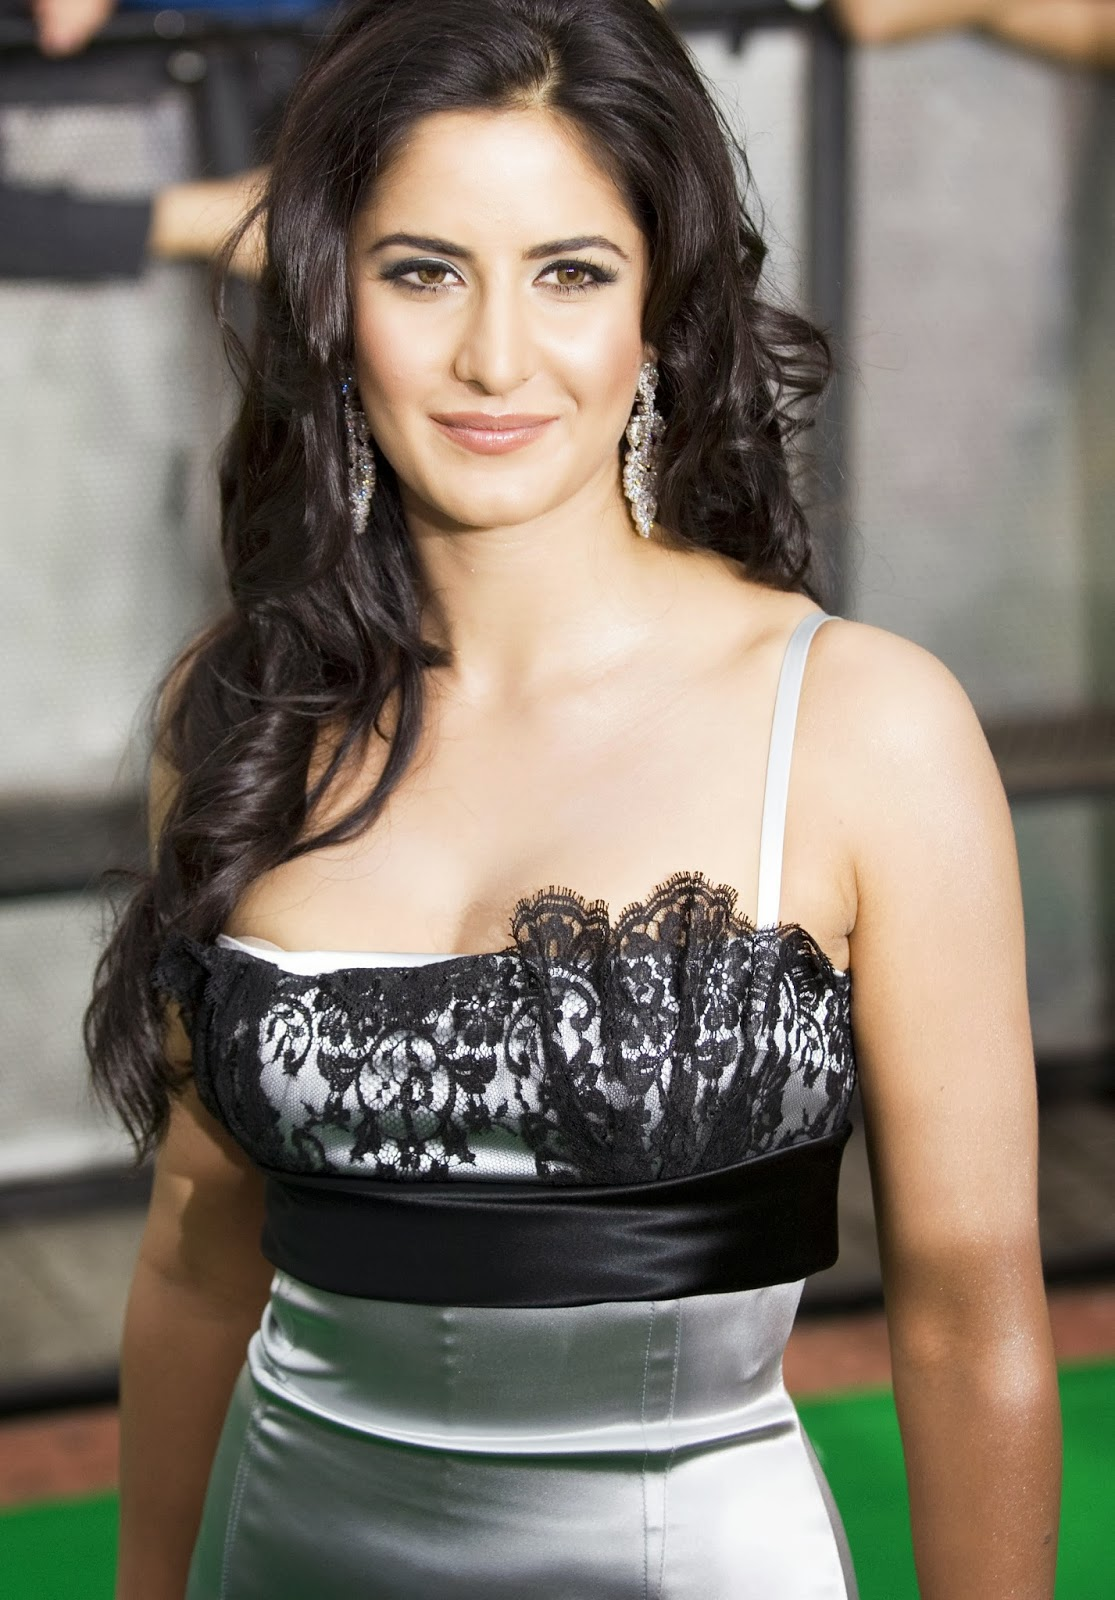 Dynamic Anda Hot Actress Sexy Katrina Kaif Photos And -5450